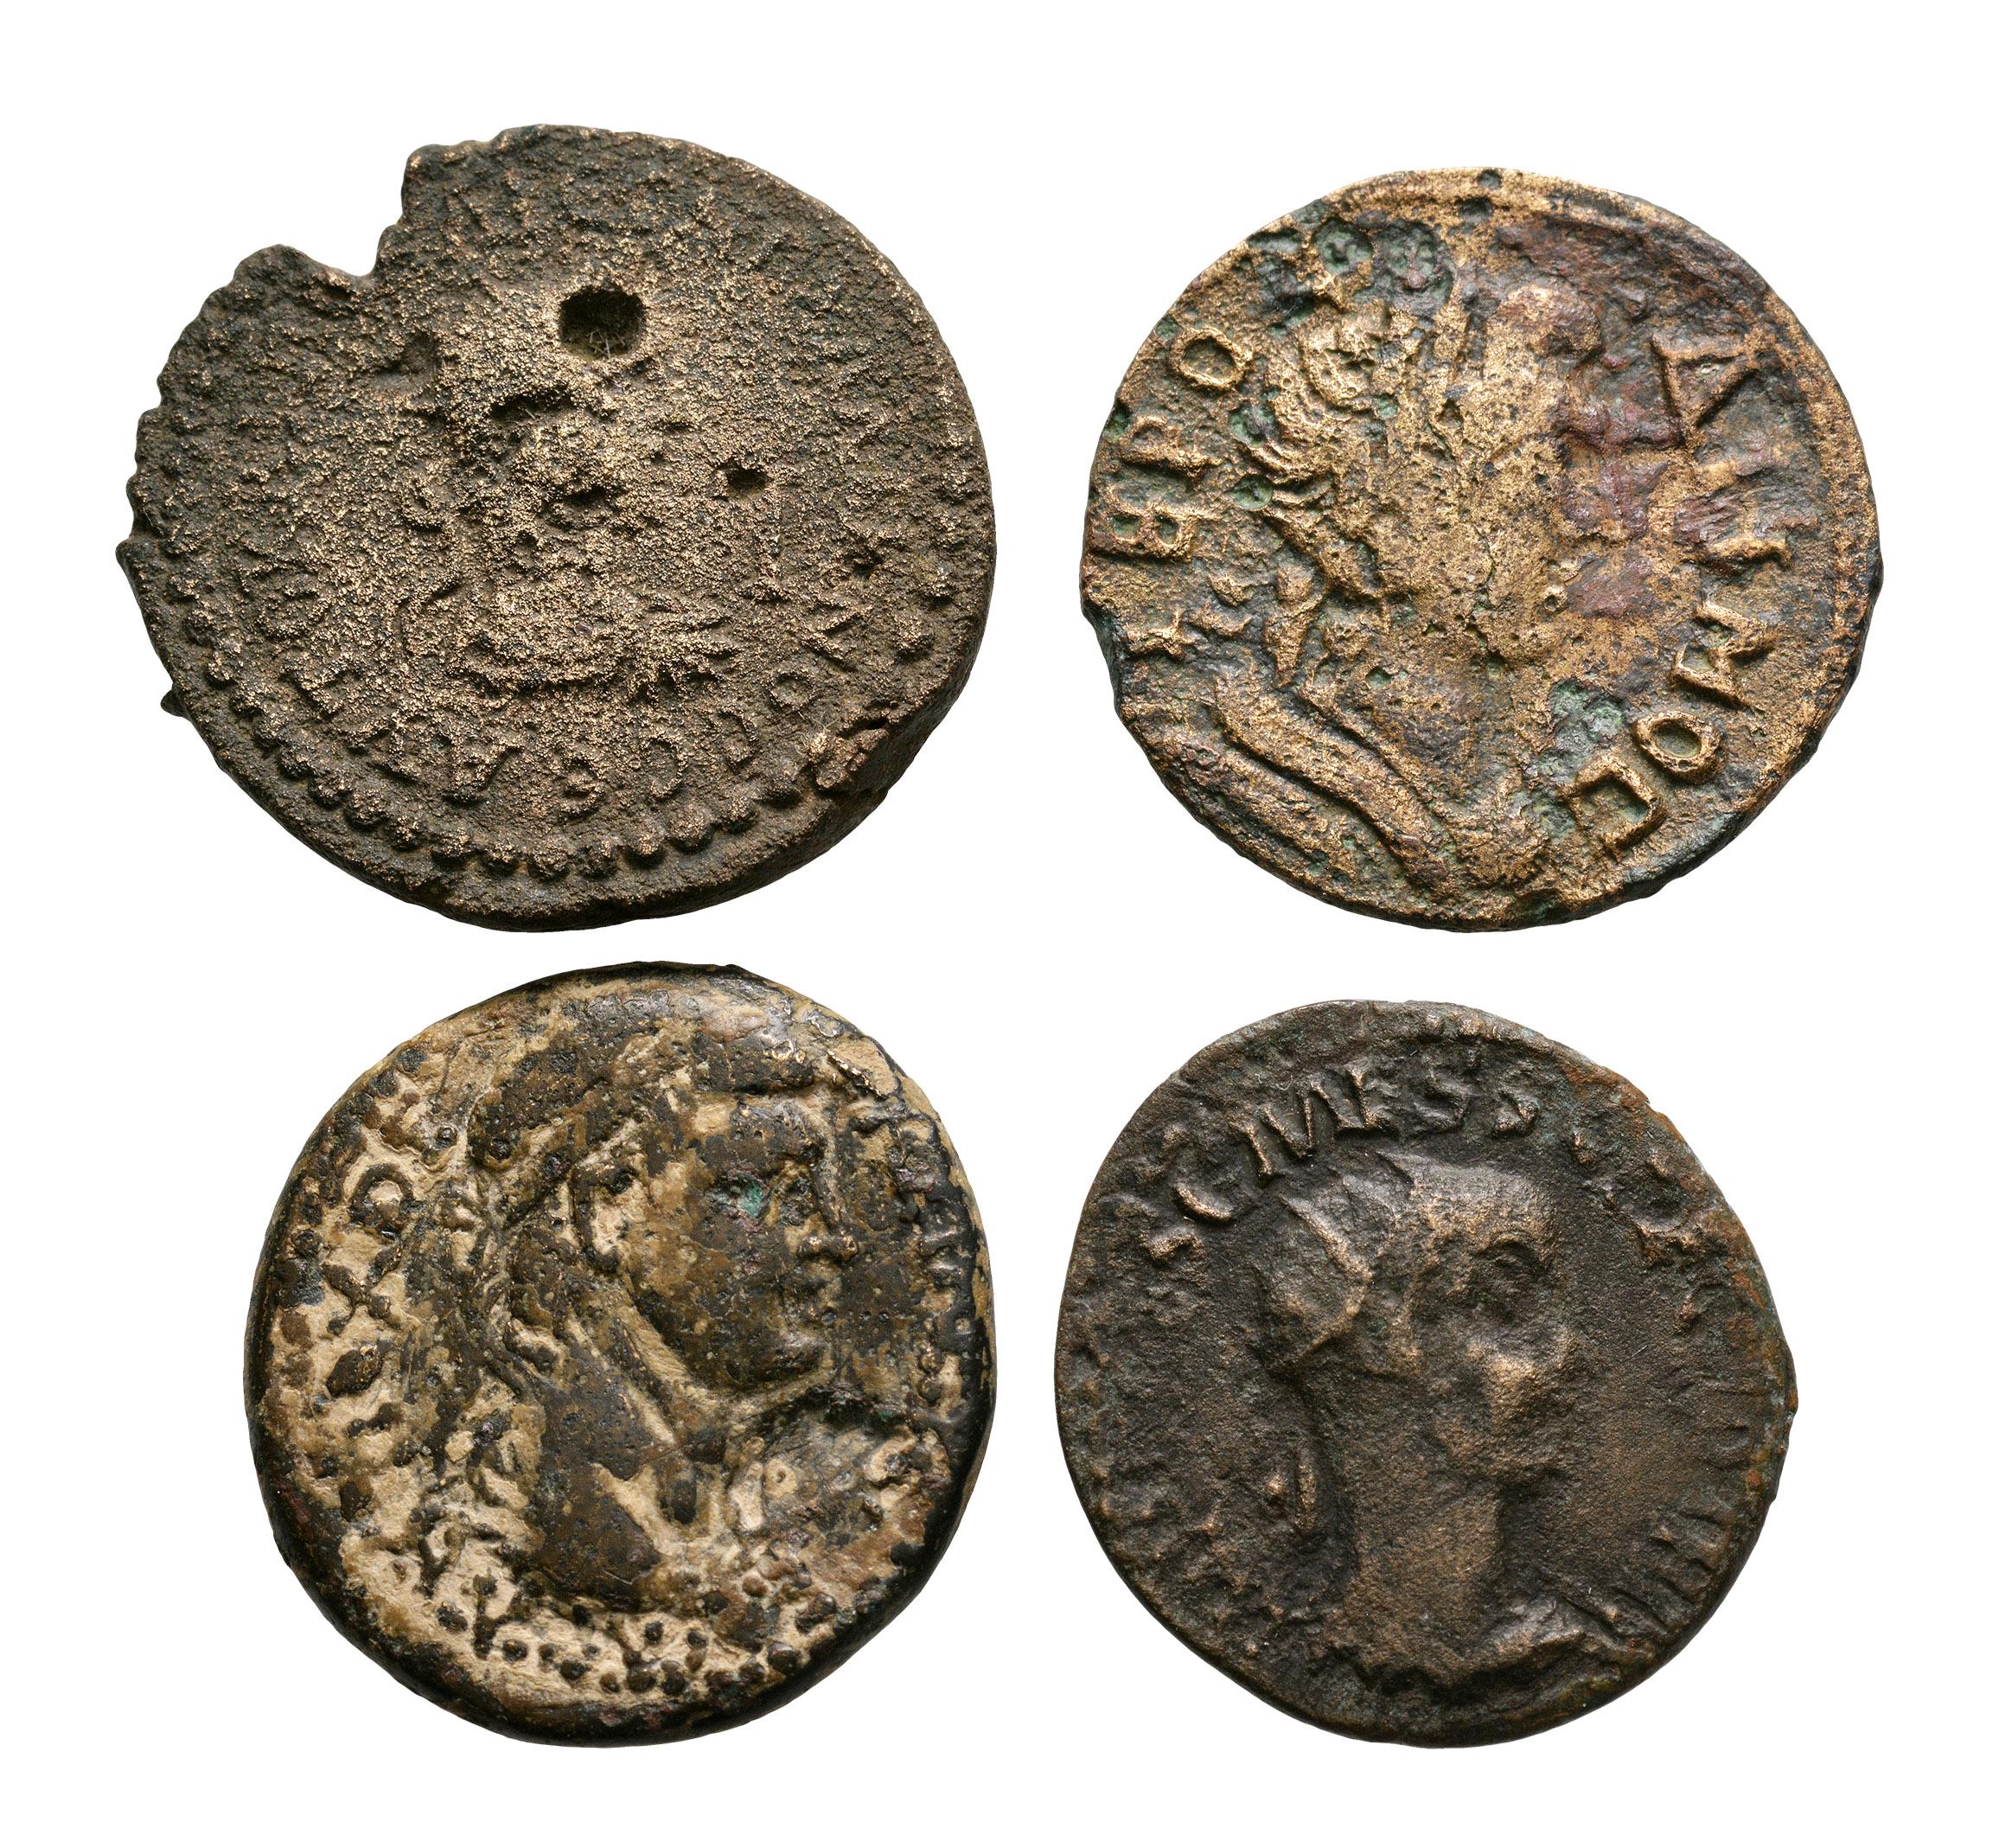 Roman Provincial Coins - Mixed Bronzes [4]